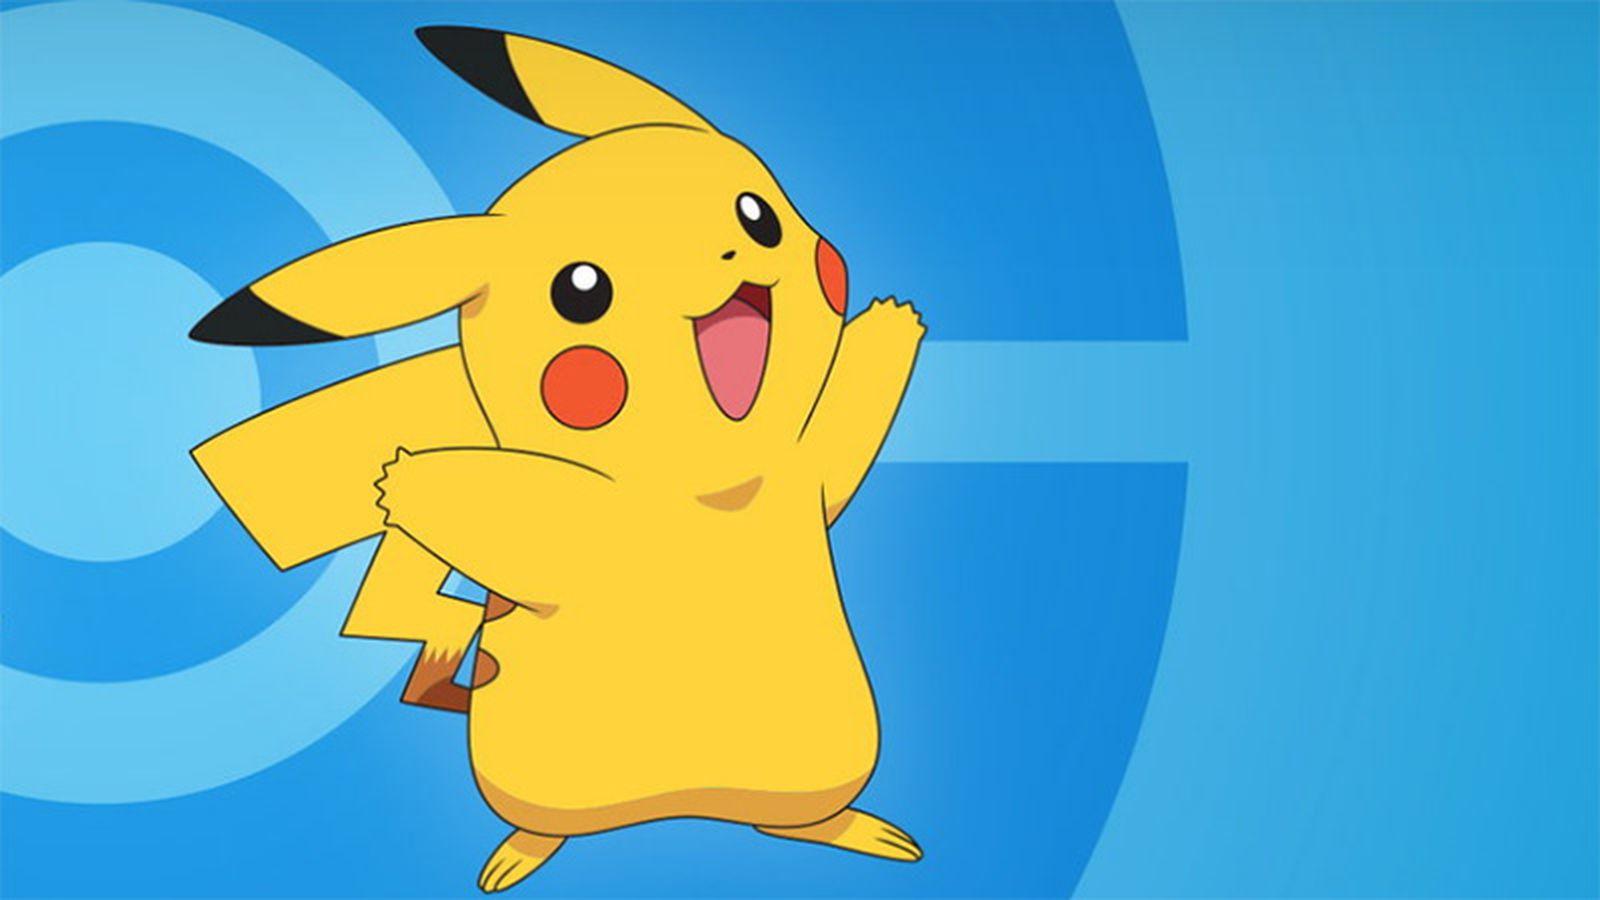 Pikachu joins build a bear workshop next year awaits your hugs polygon - Image pikachu ...